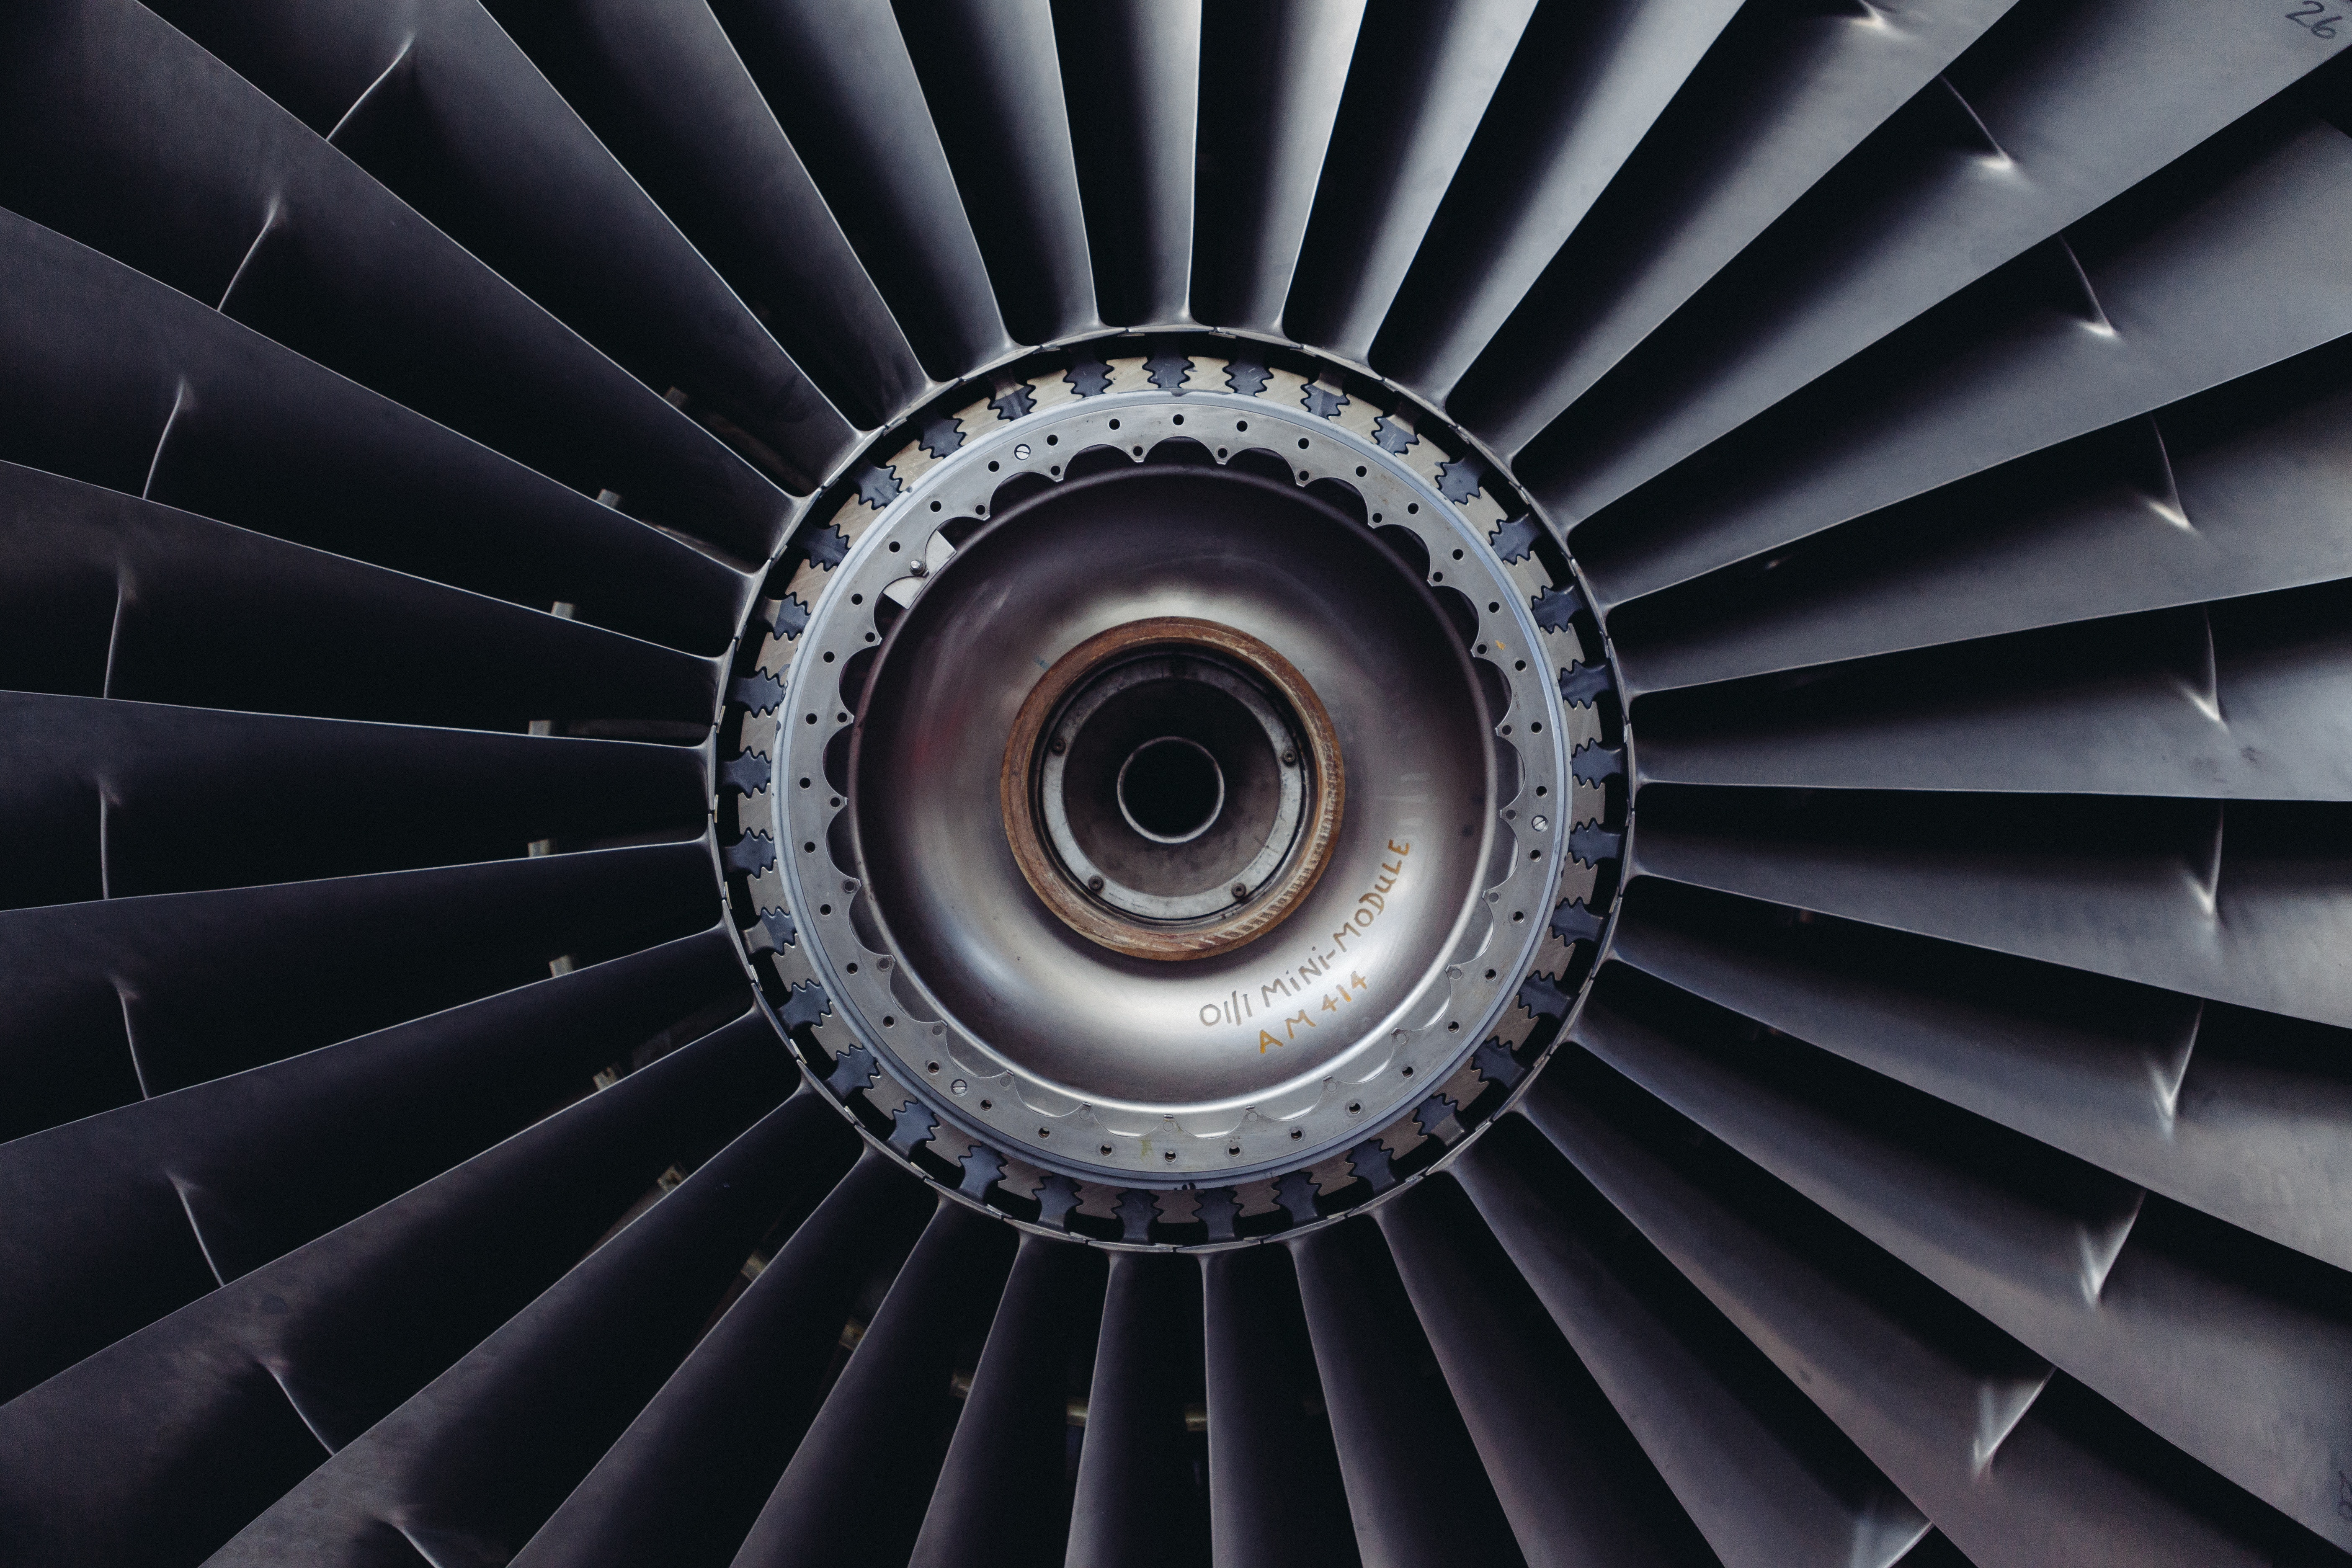 Level 3 BTEC Extended Diploma Aeronautical Engineering